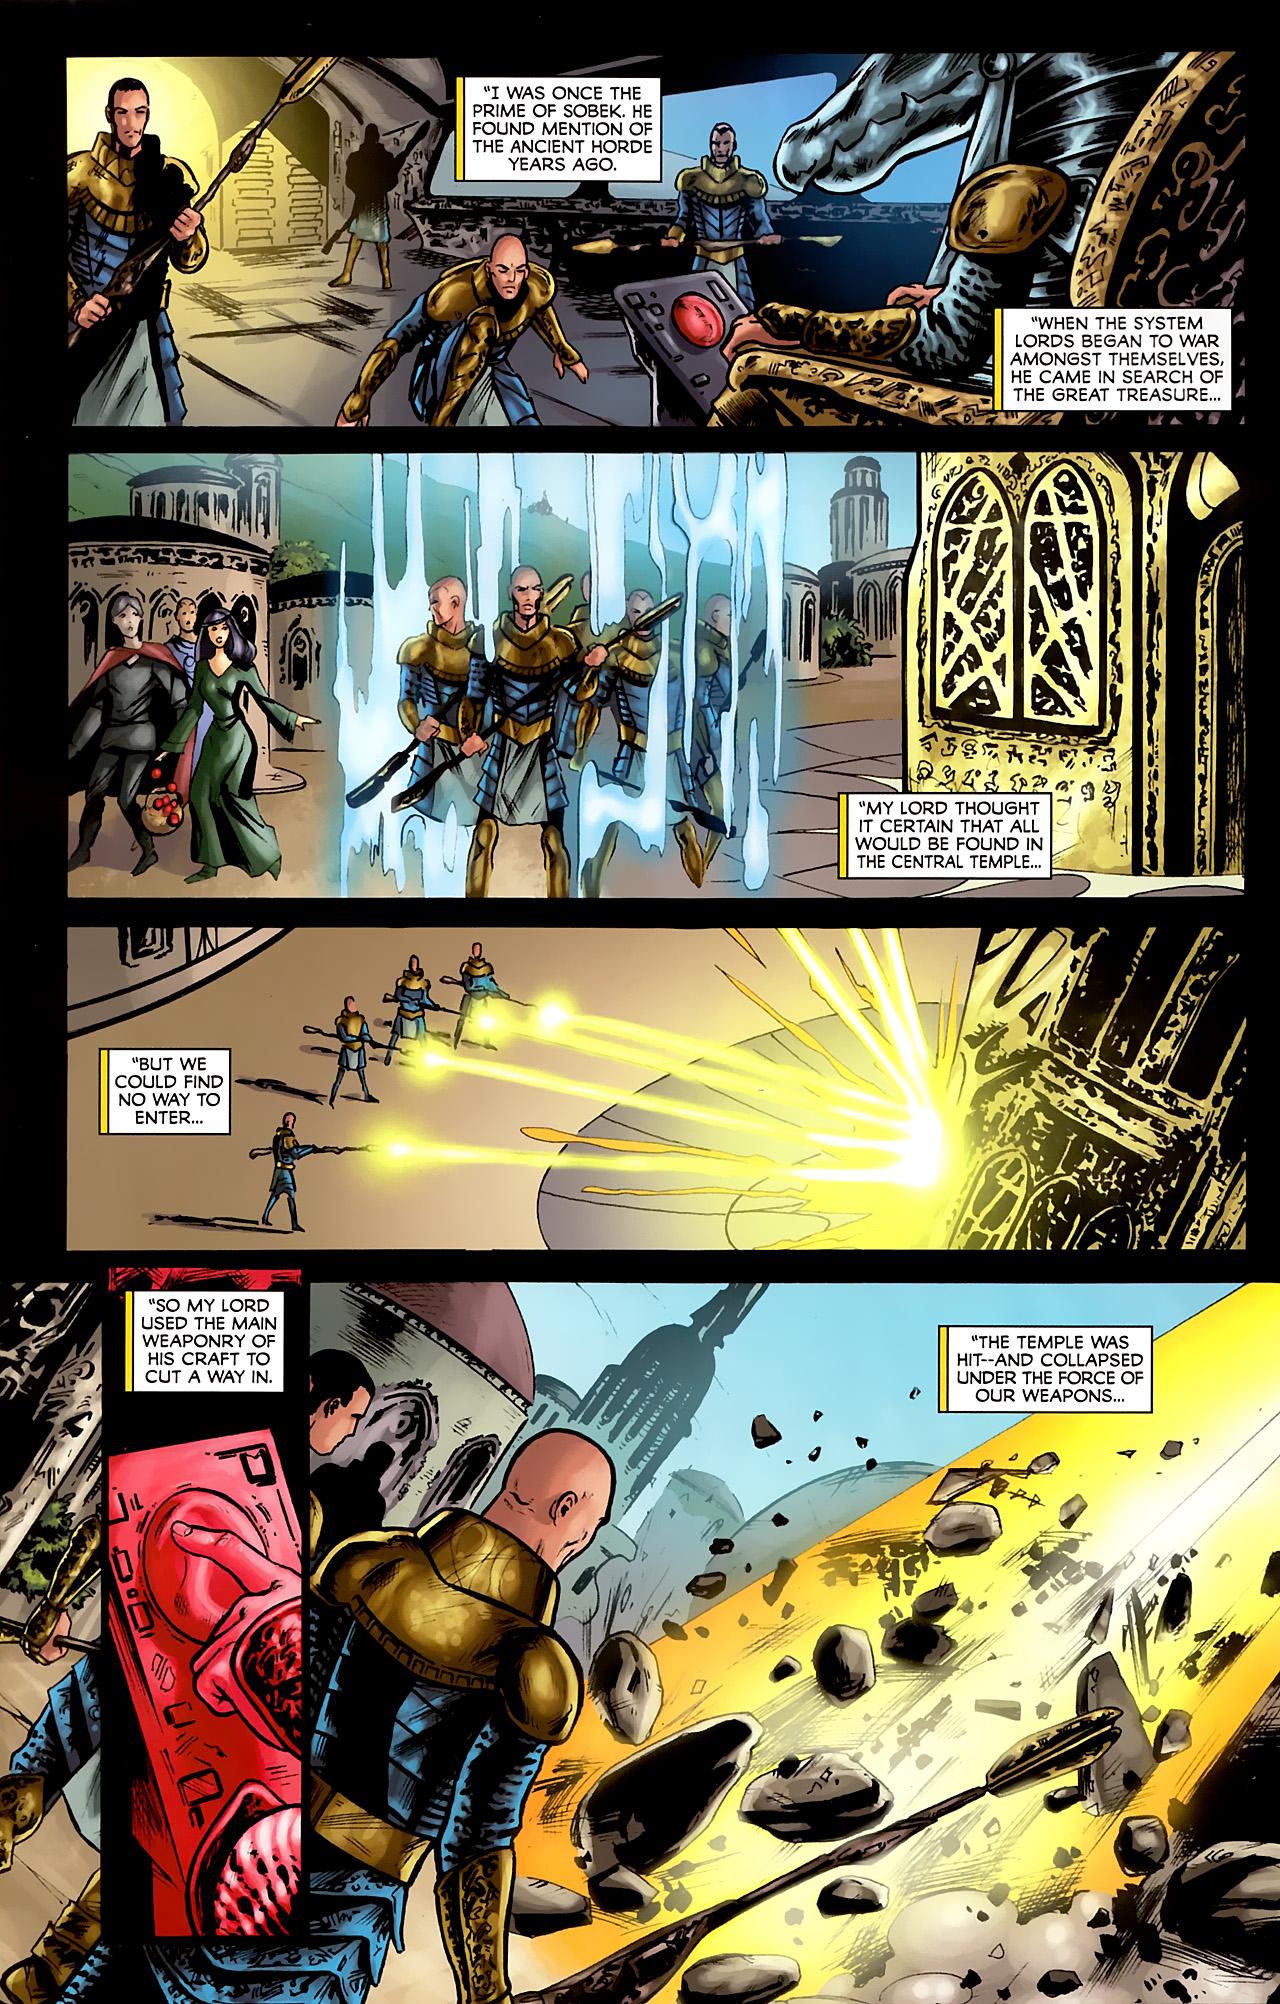 Read online Stargate: Daniel Jackson comic -  Issue #2 - 6